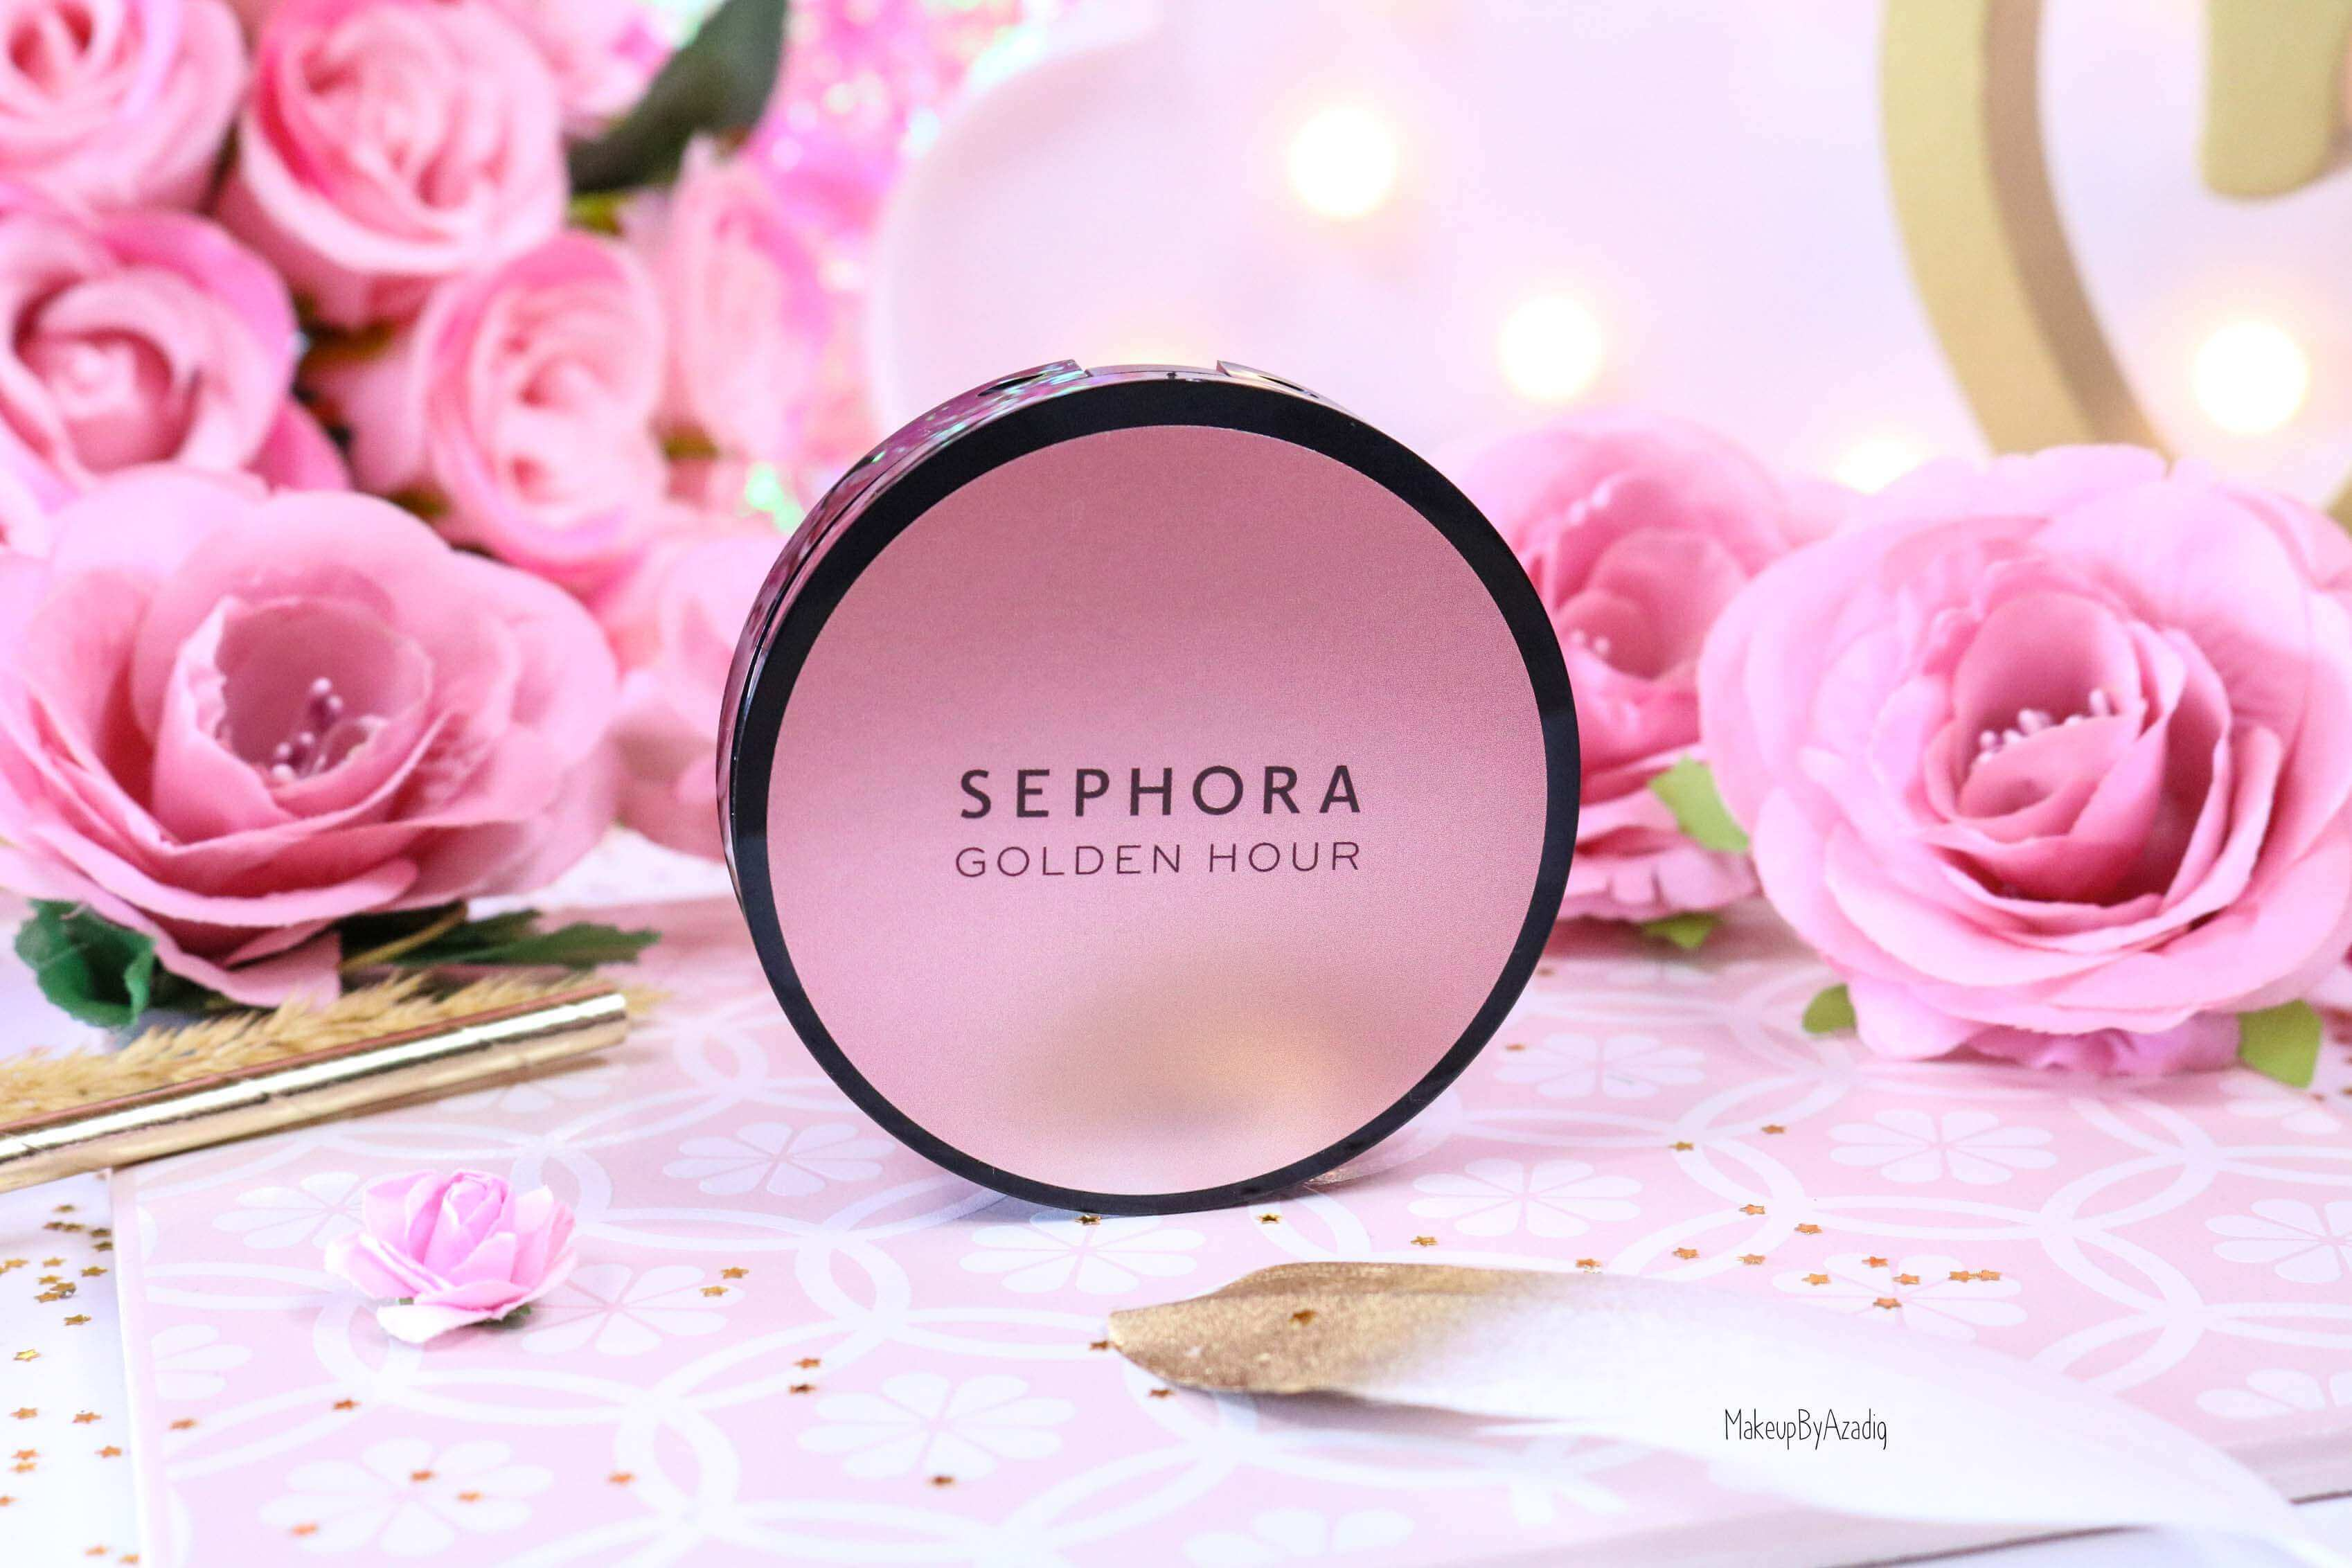 revue-highlighter-poudre-illuminatrice-golden-hour-dusk-sephora-collection-rosegold-avis-prix-swatch-makeupbyazadig-miniature